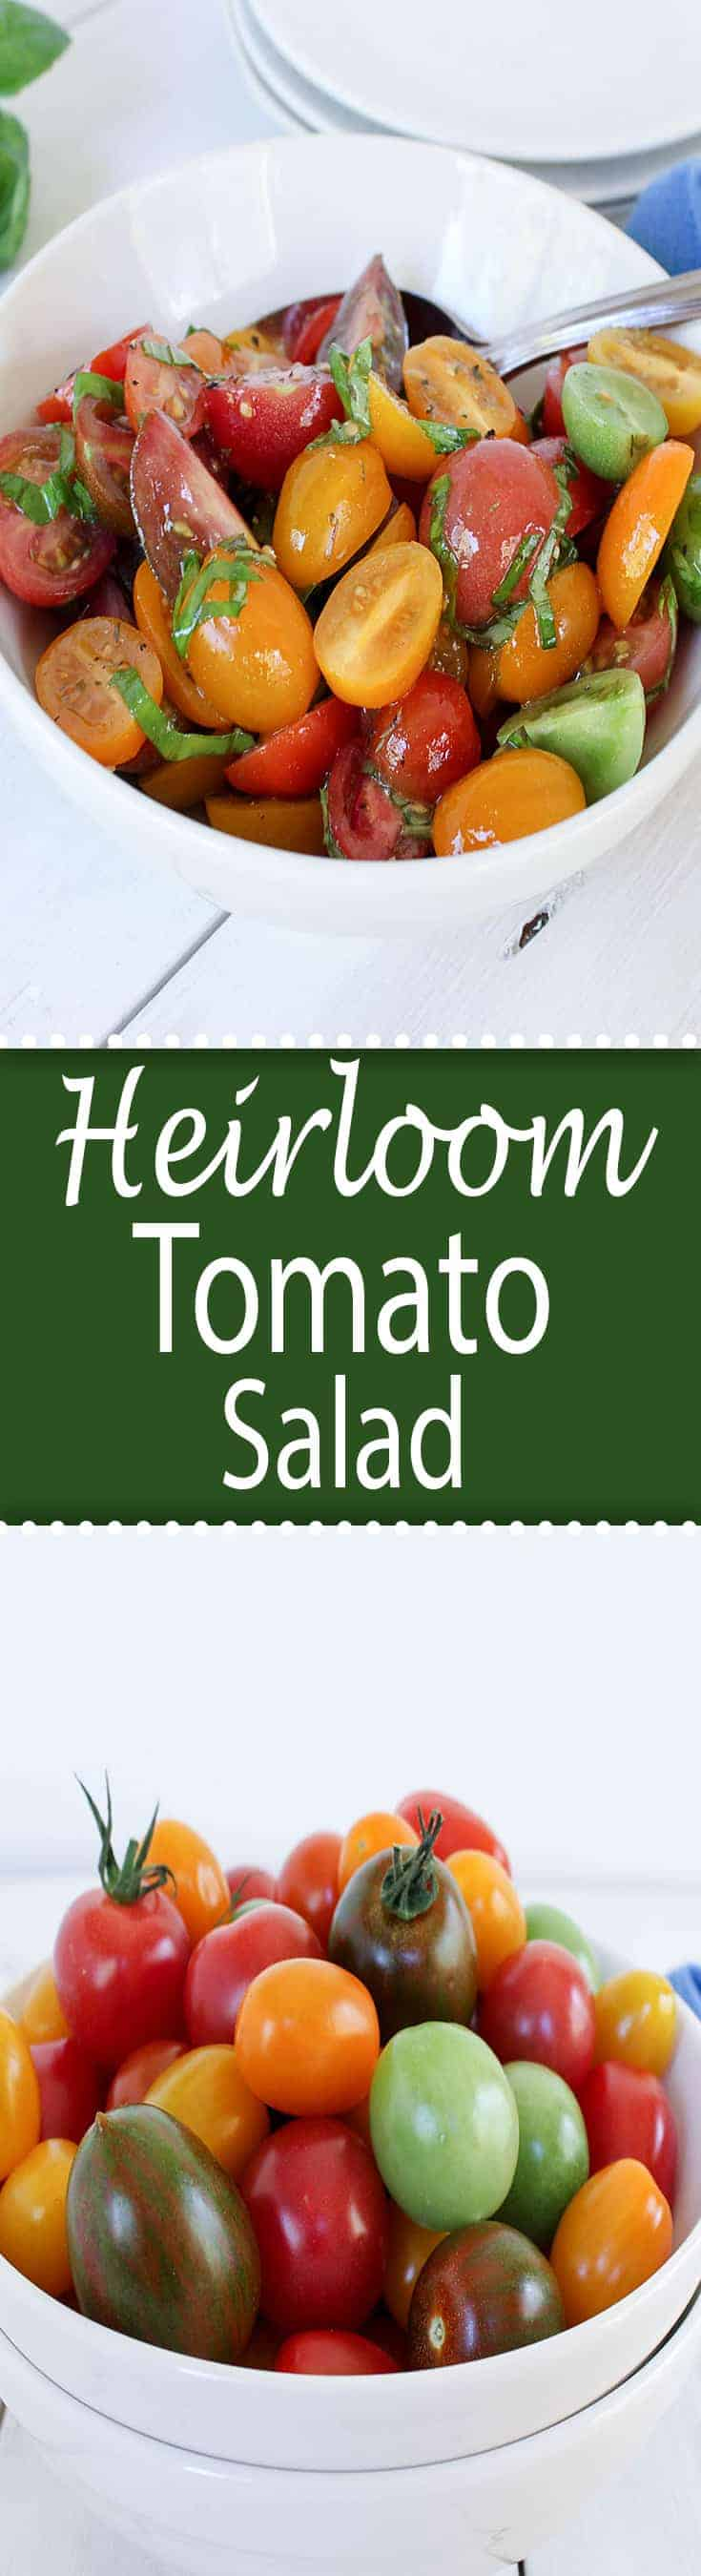 Heirloom Tomato Salad with fresh basil